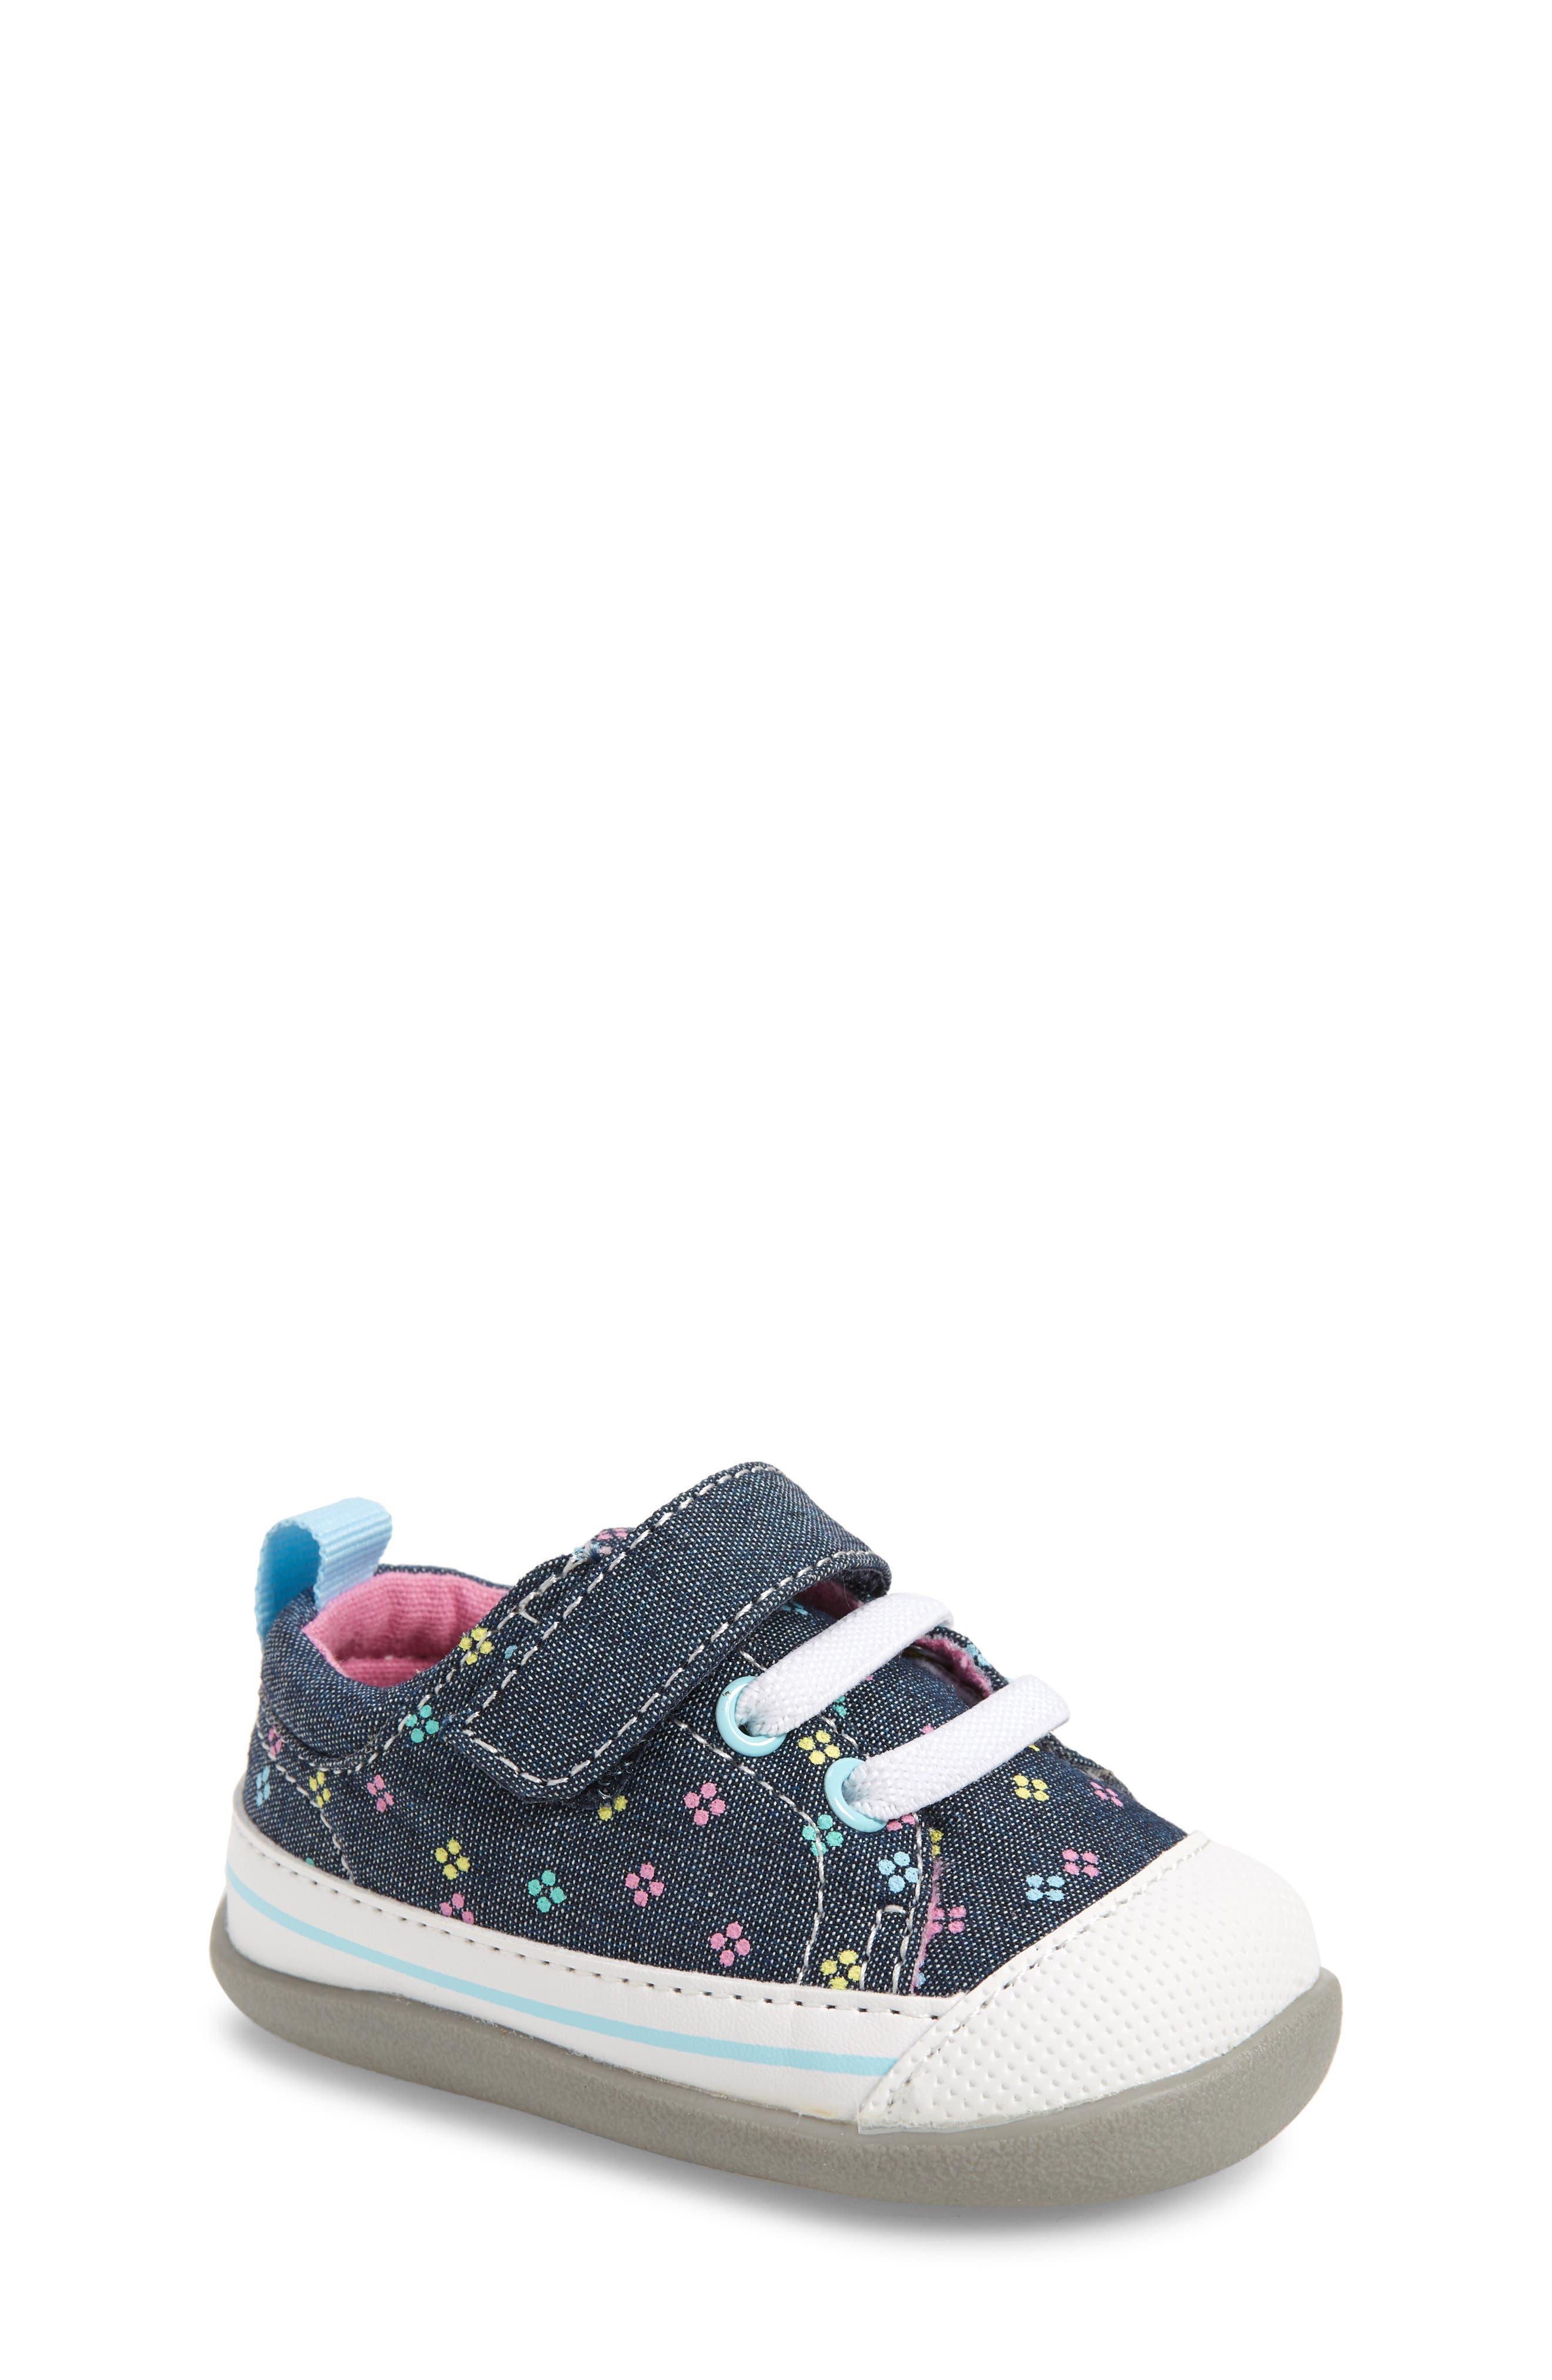 Kids' See Kai Run Shoes | Nordstrom